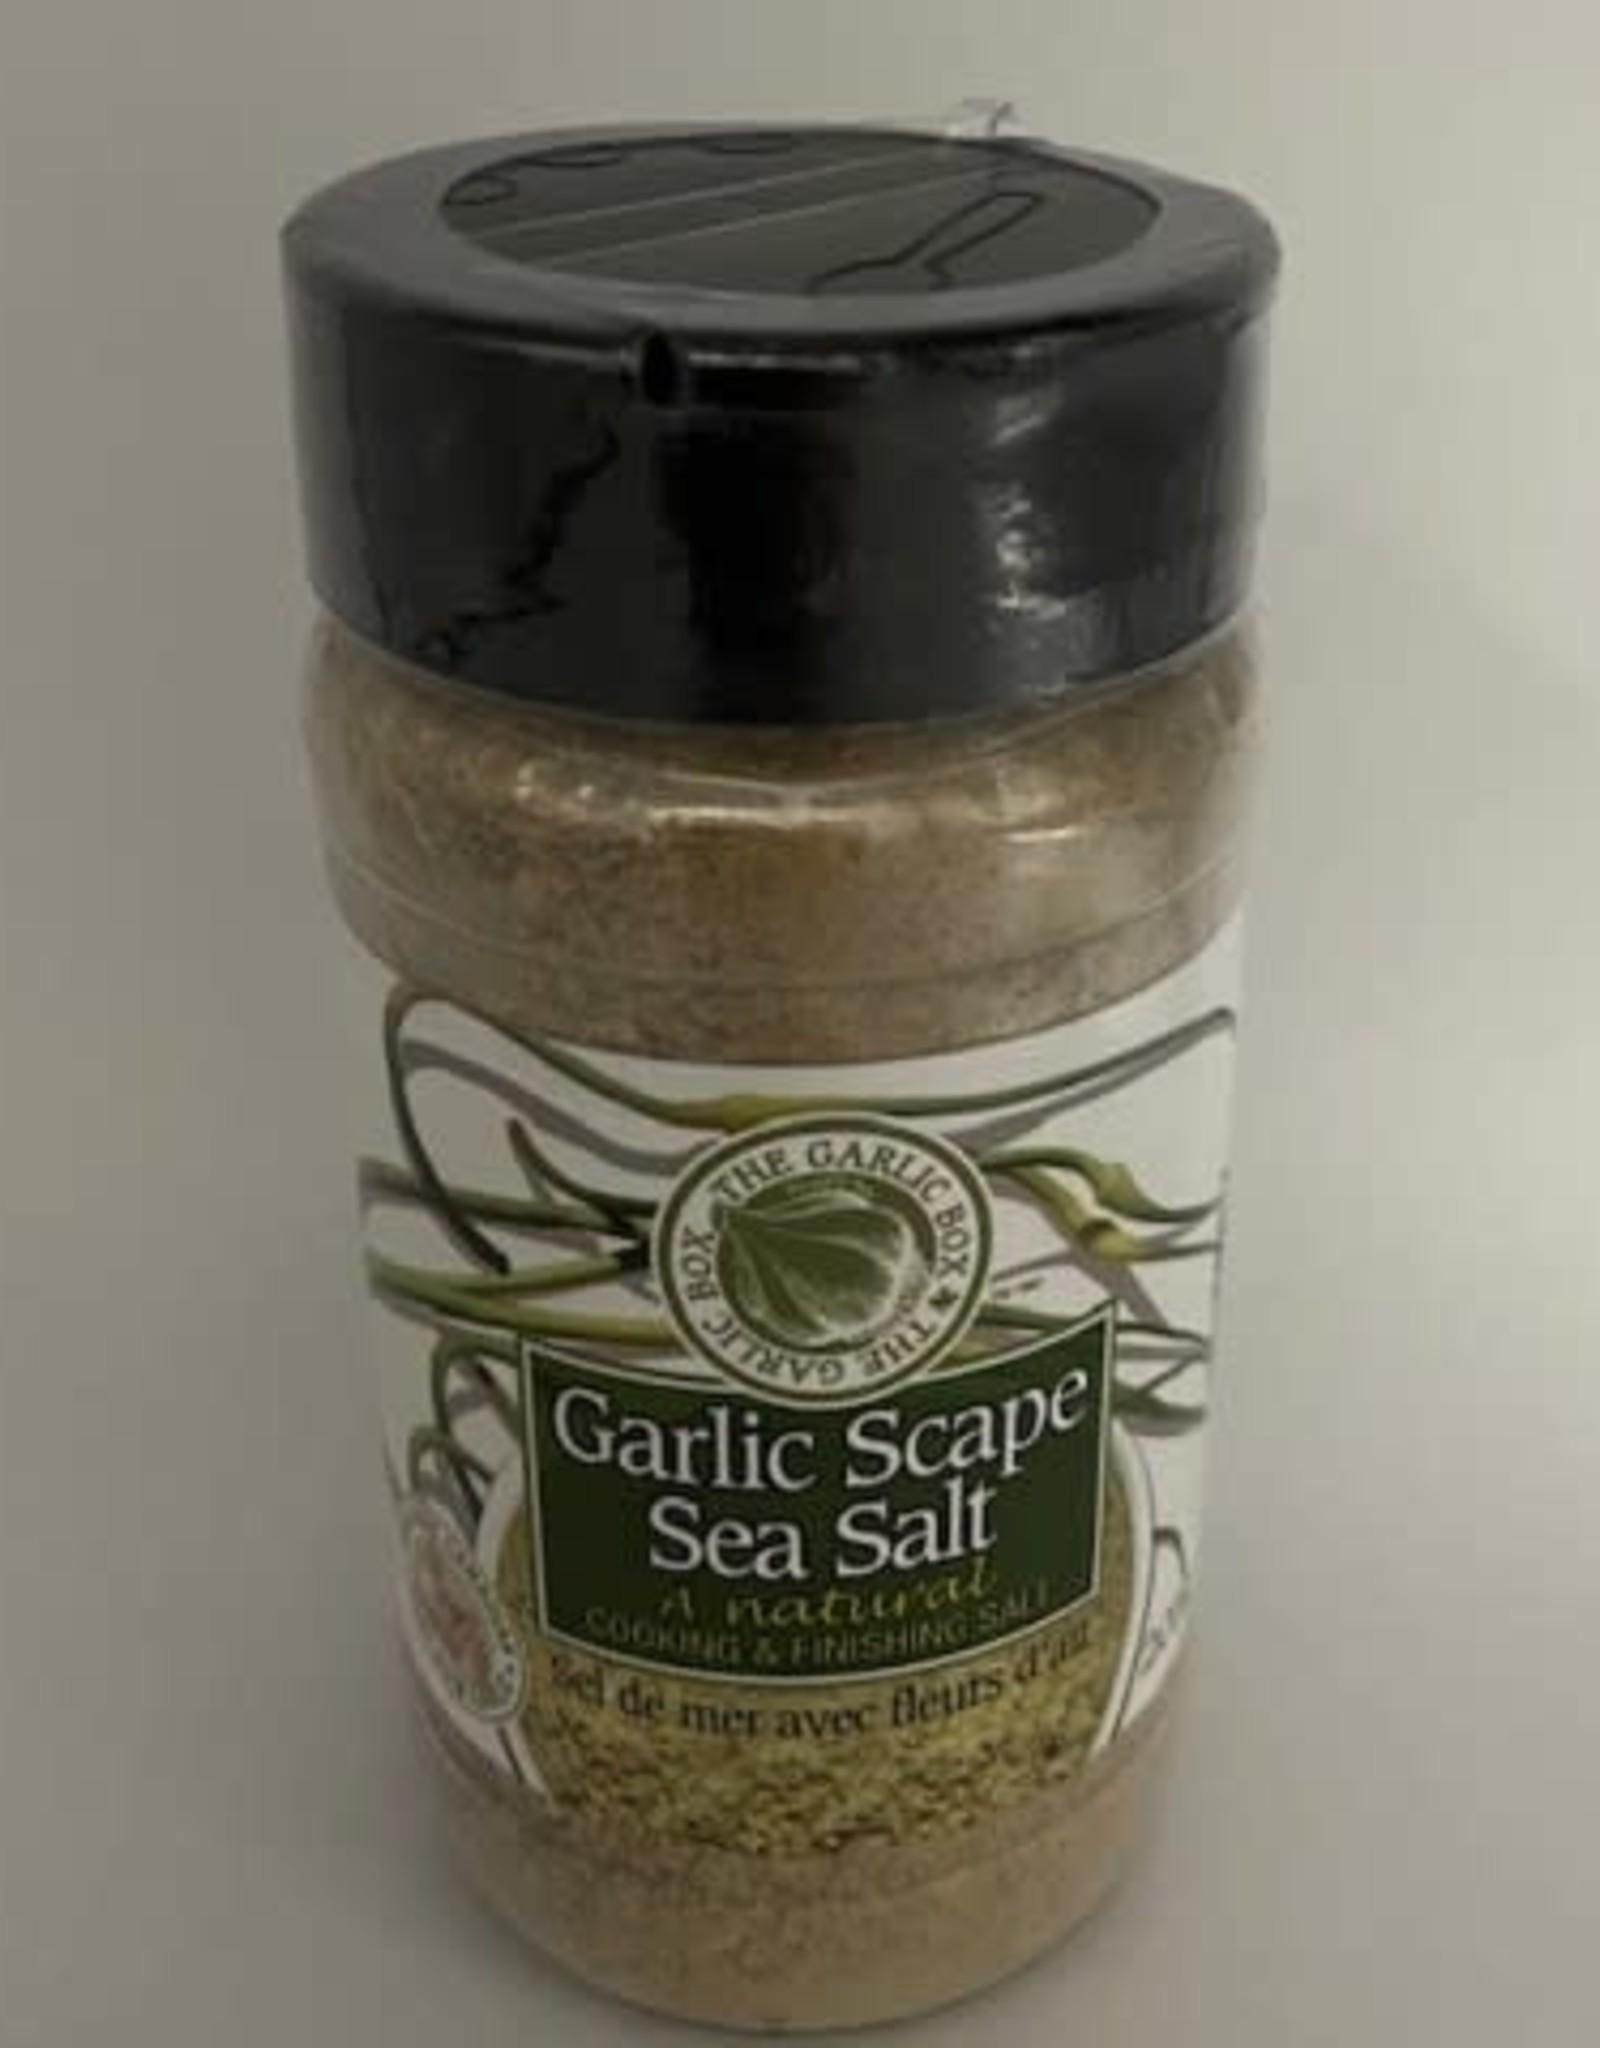 The Garlic Box Garlic Scape Sea Salt